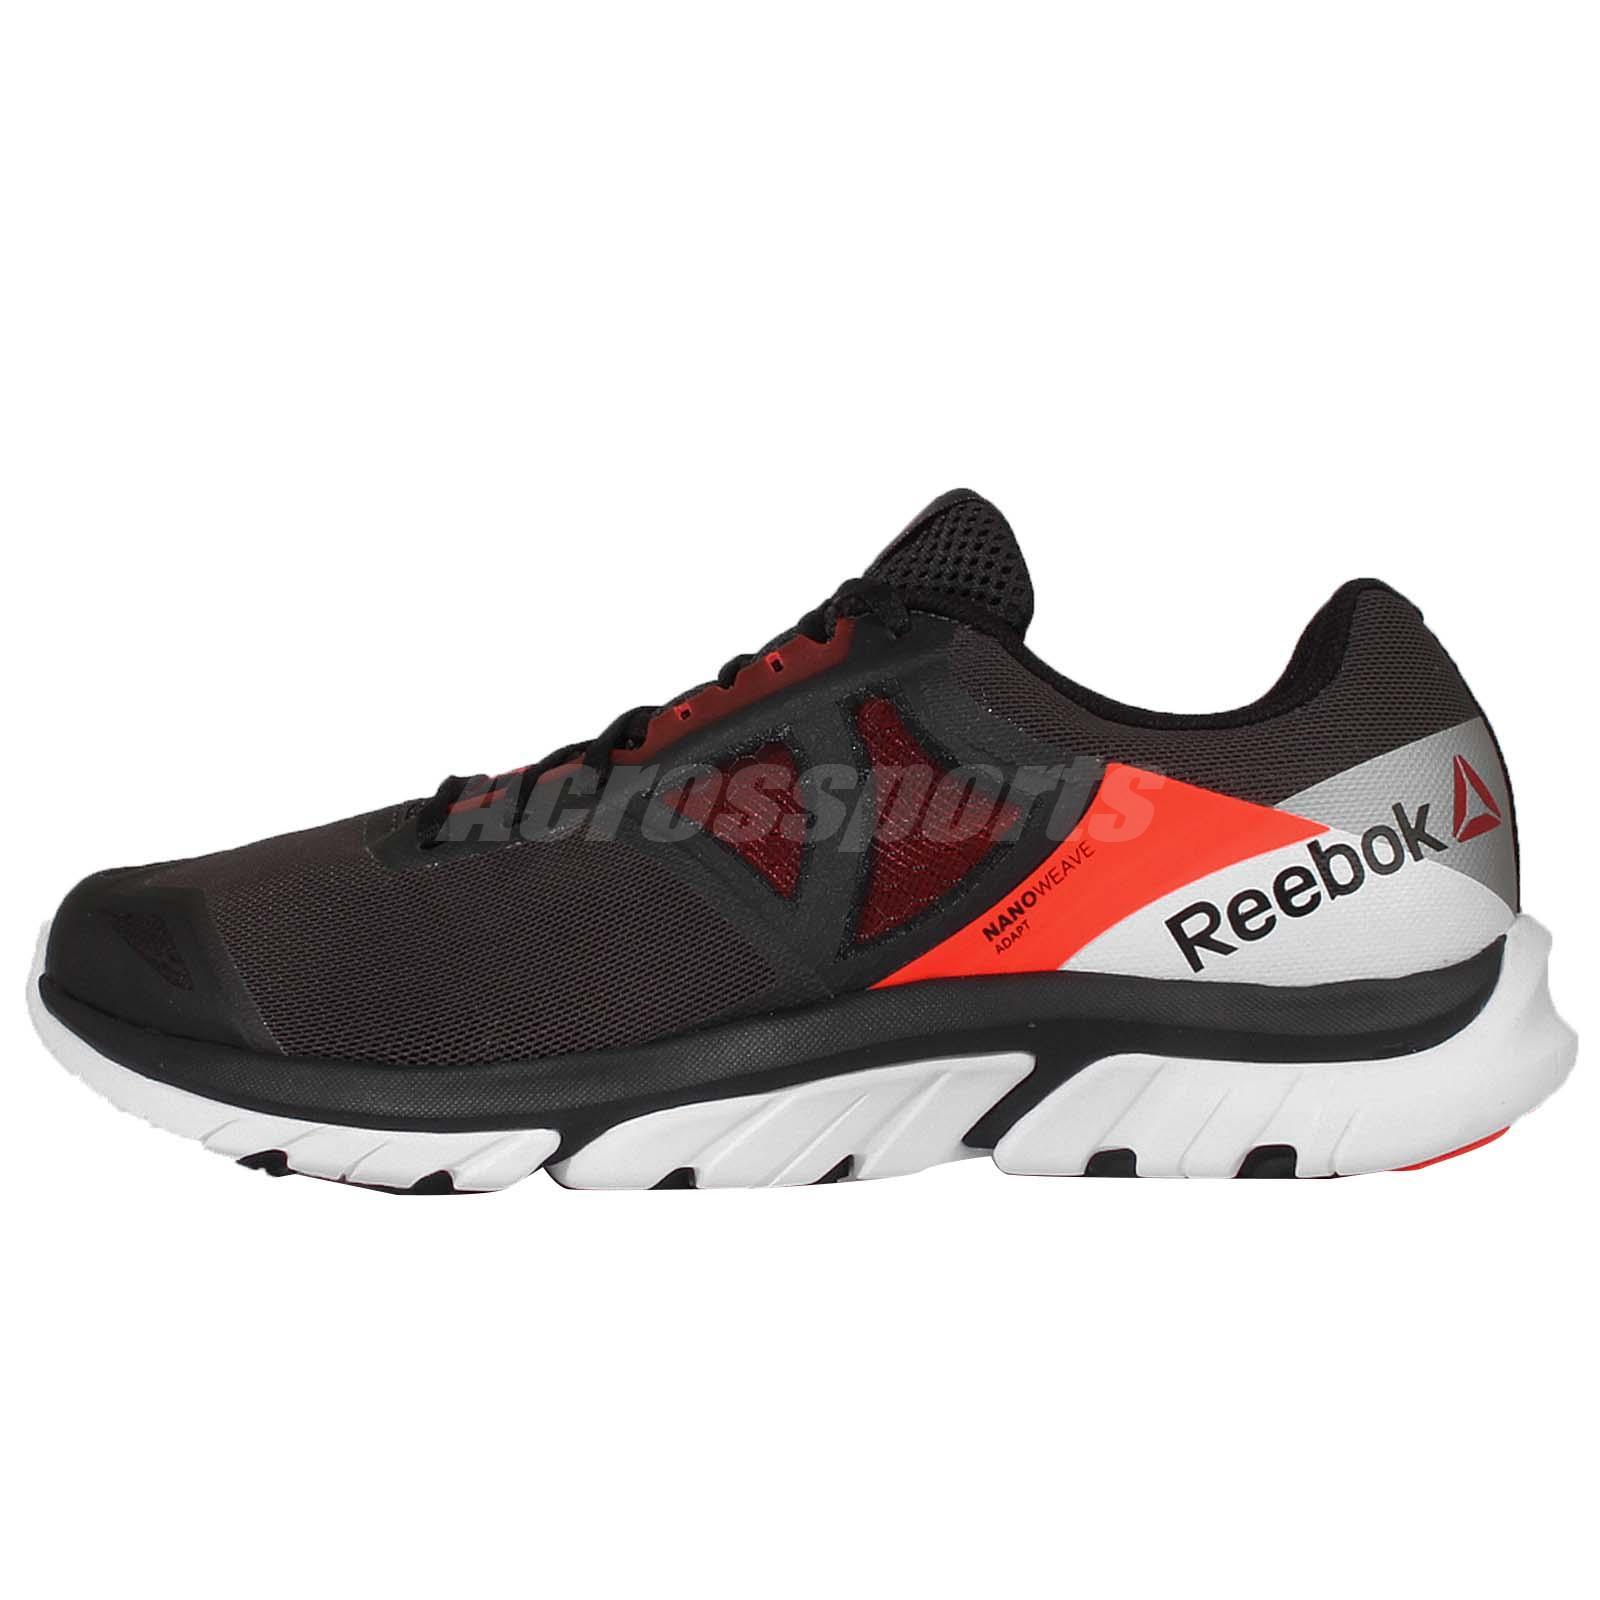 timeless design 93487 f4ab9 ... Reviews reebok jetfuse shoes Buy Reebok Men Black ...